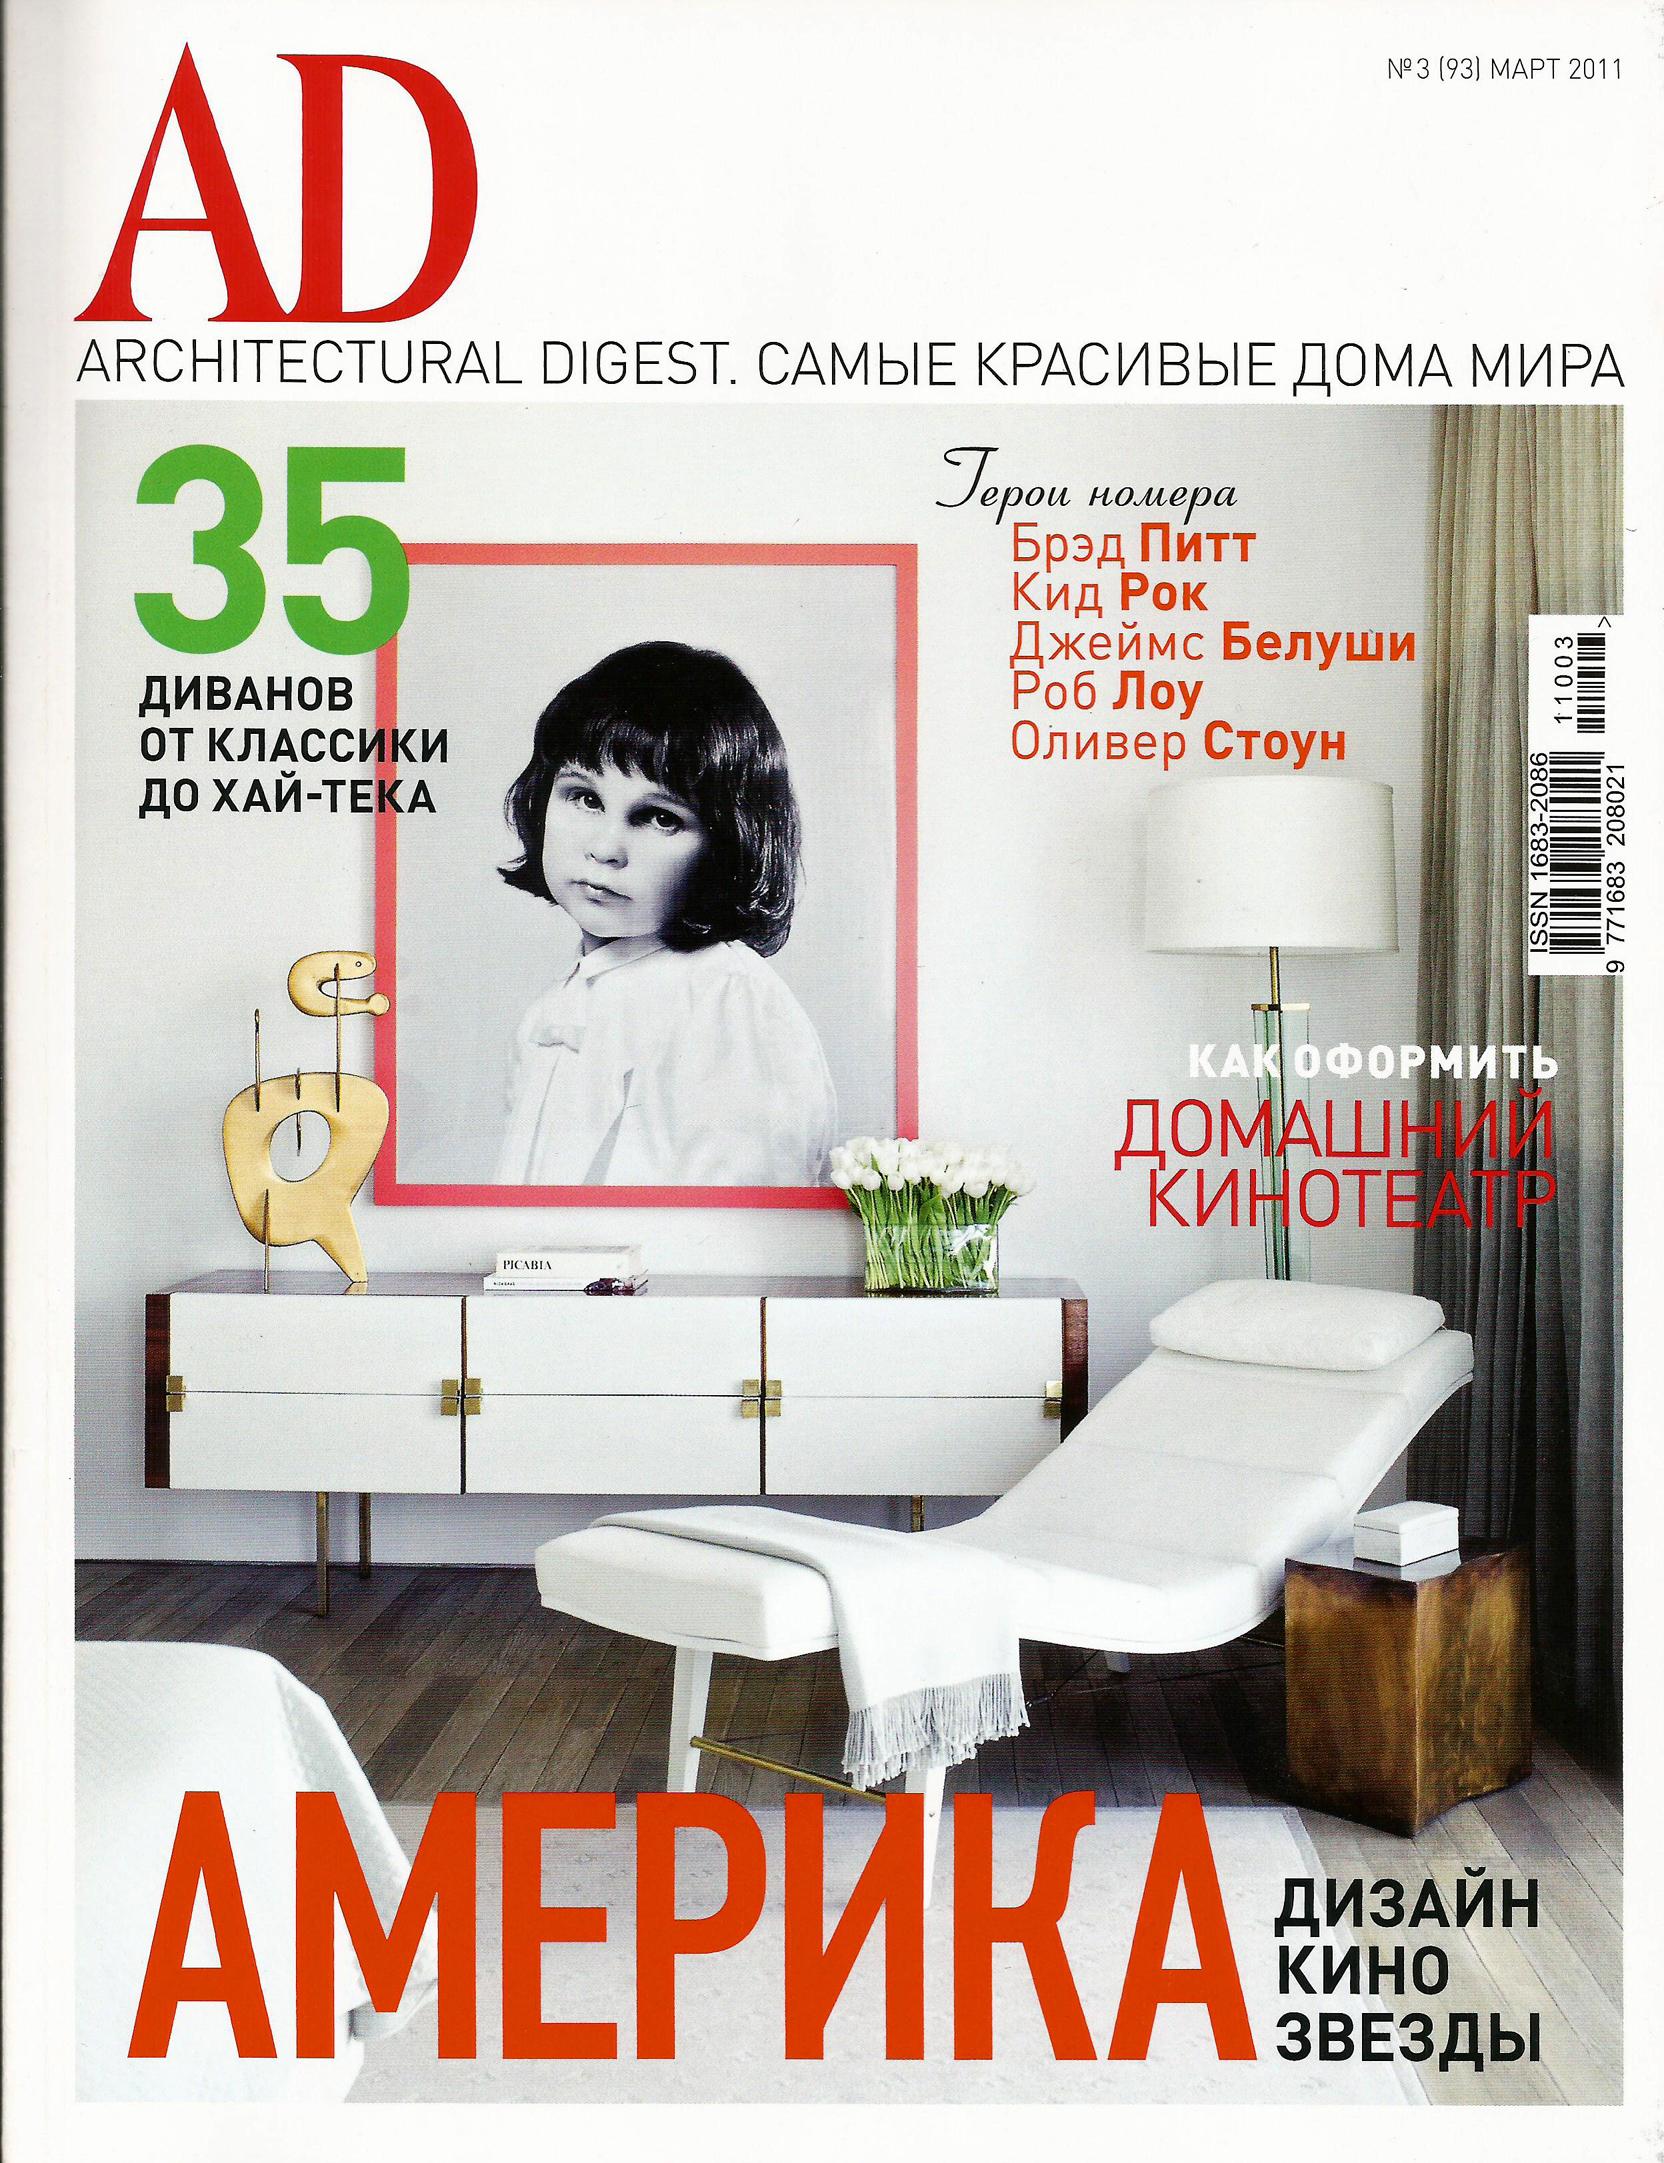 AD март 2011sm.jpg